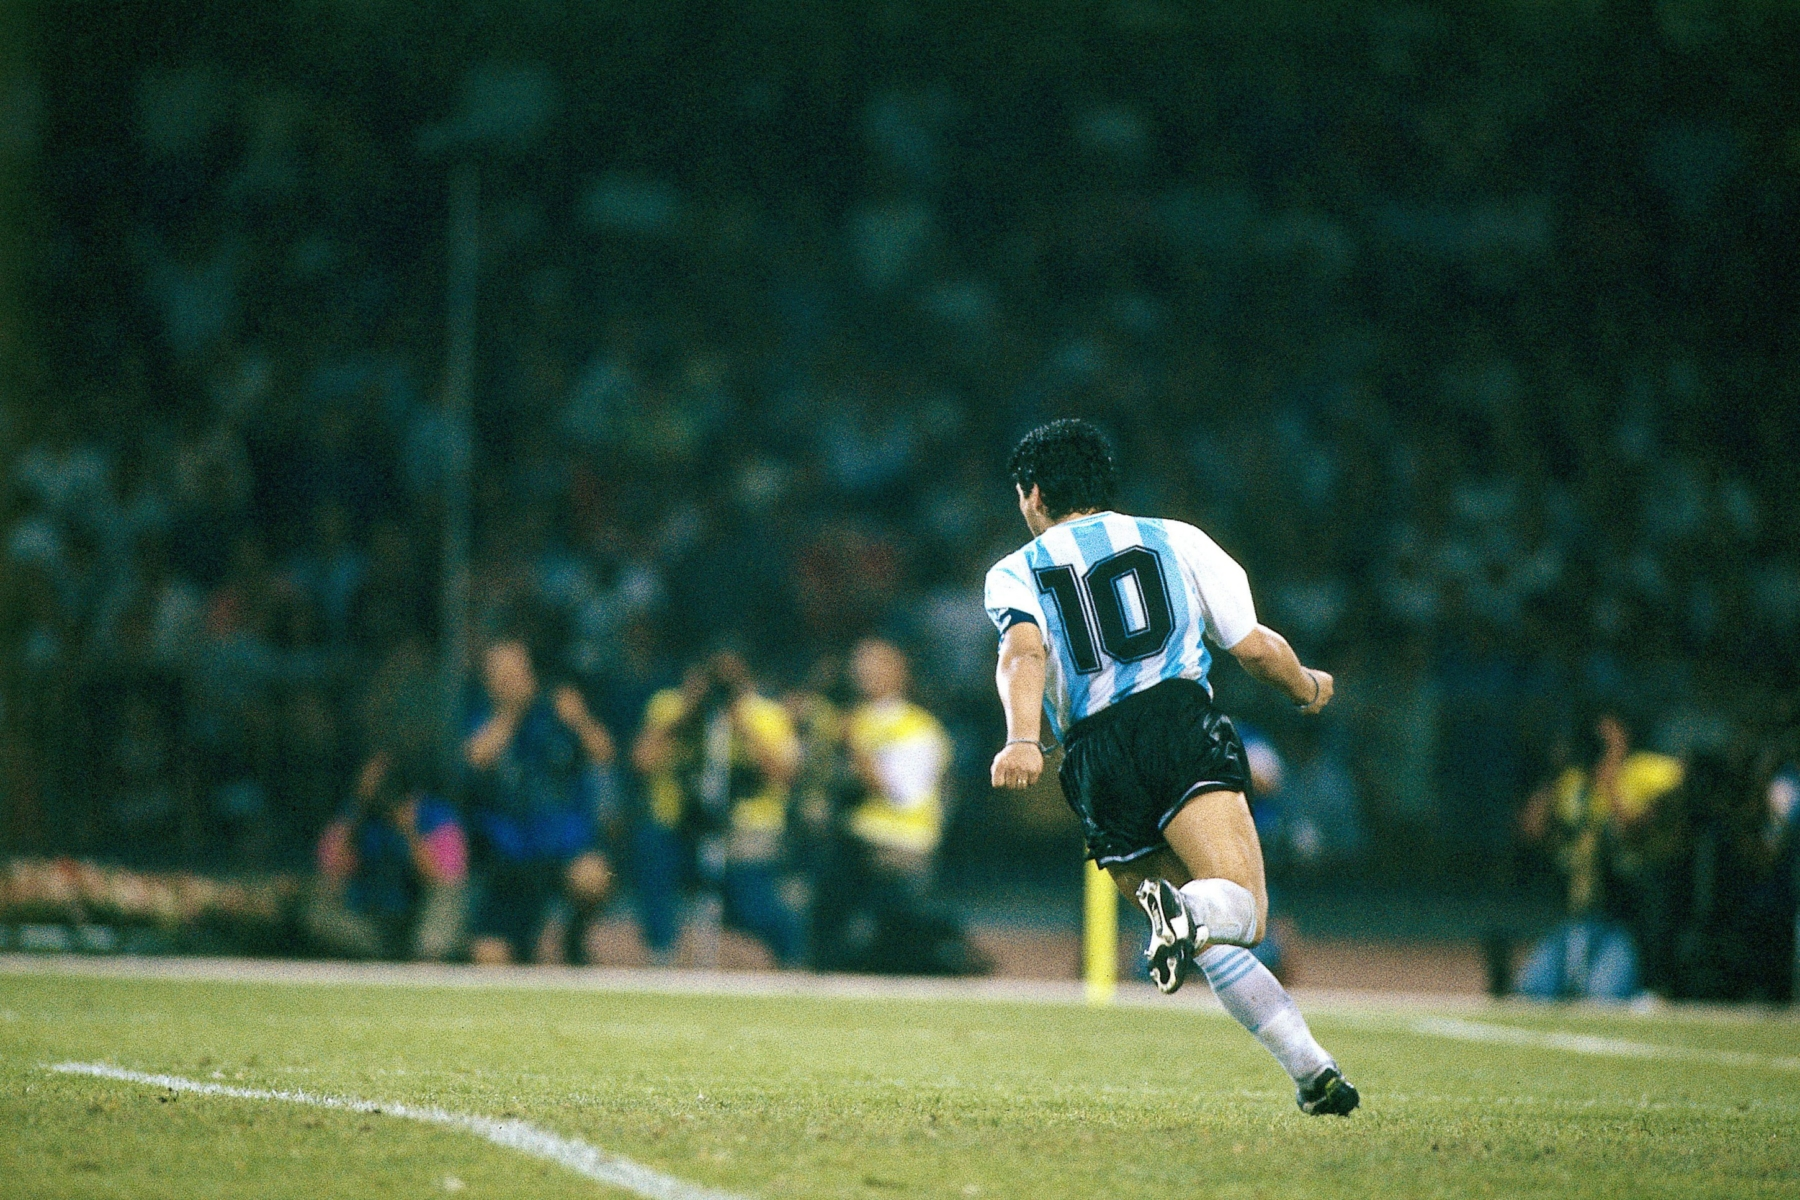 The last stand of Diego Maradona